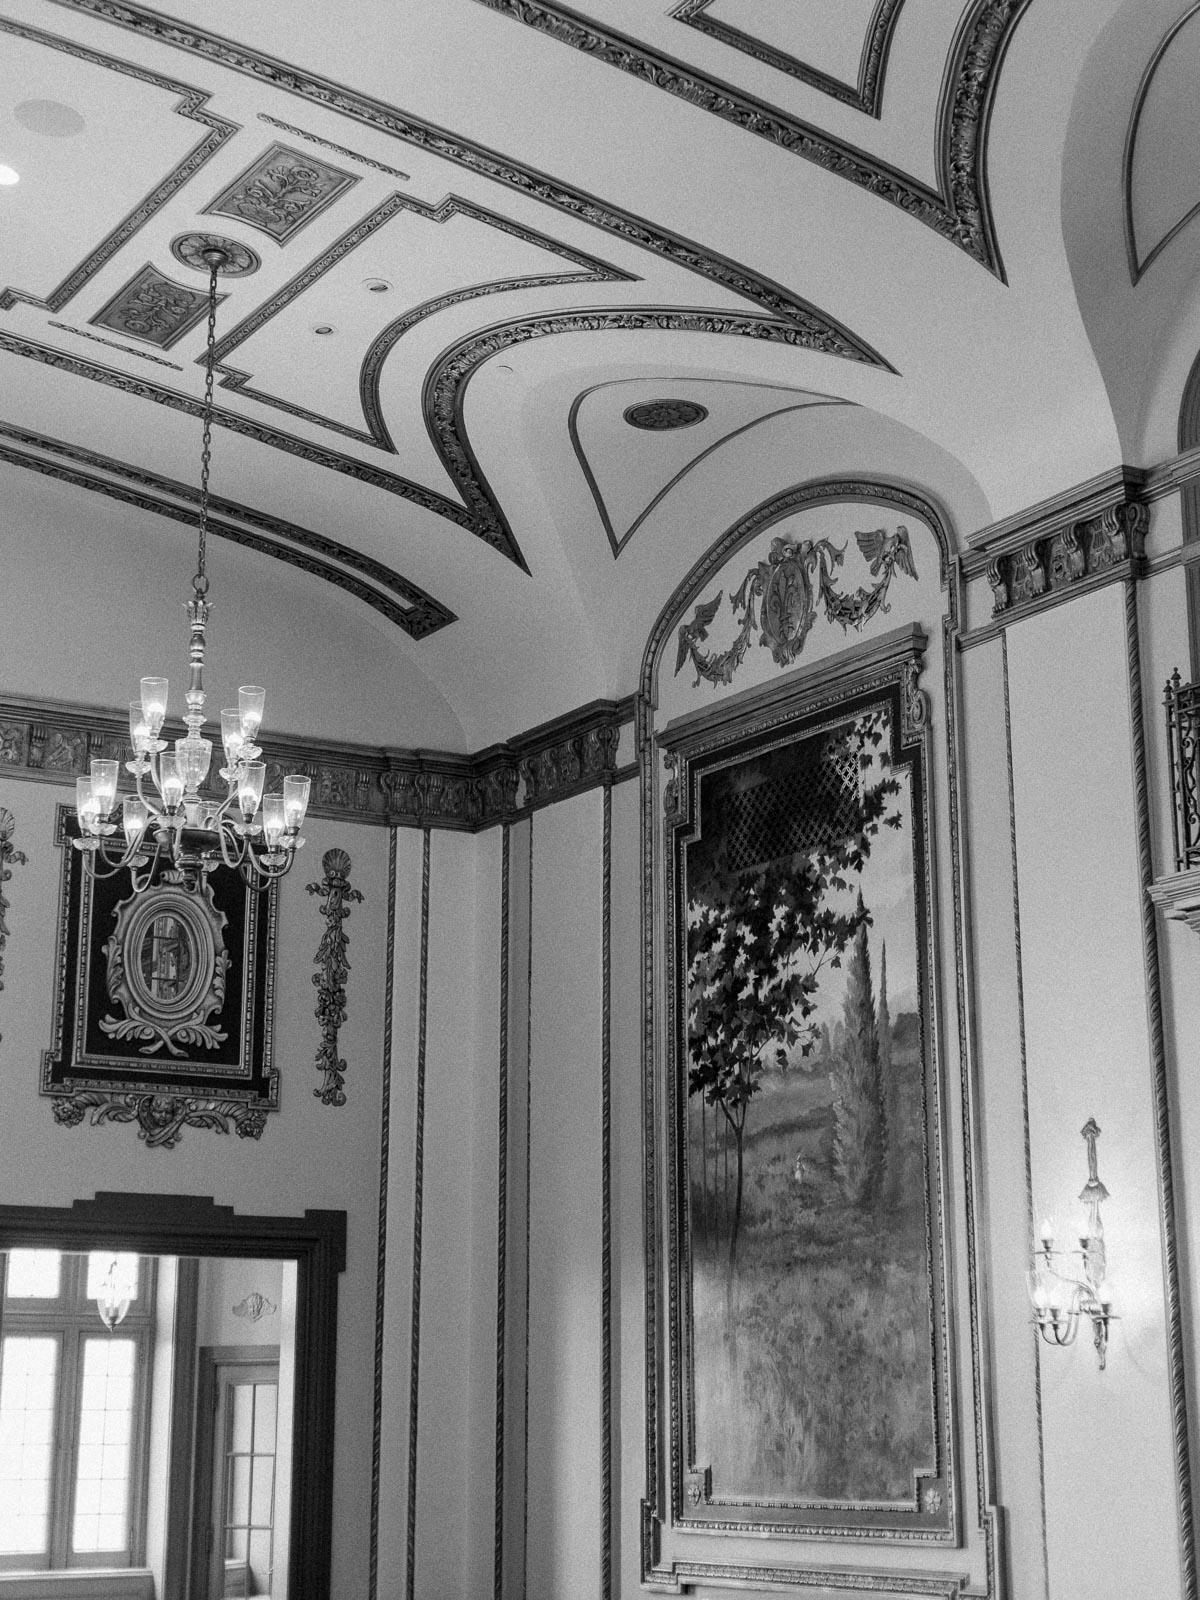 tudor-arms-hotel-cleveland-wedding-venue-photos-by-matt-erickson-photography-4.jpg